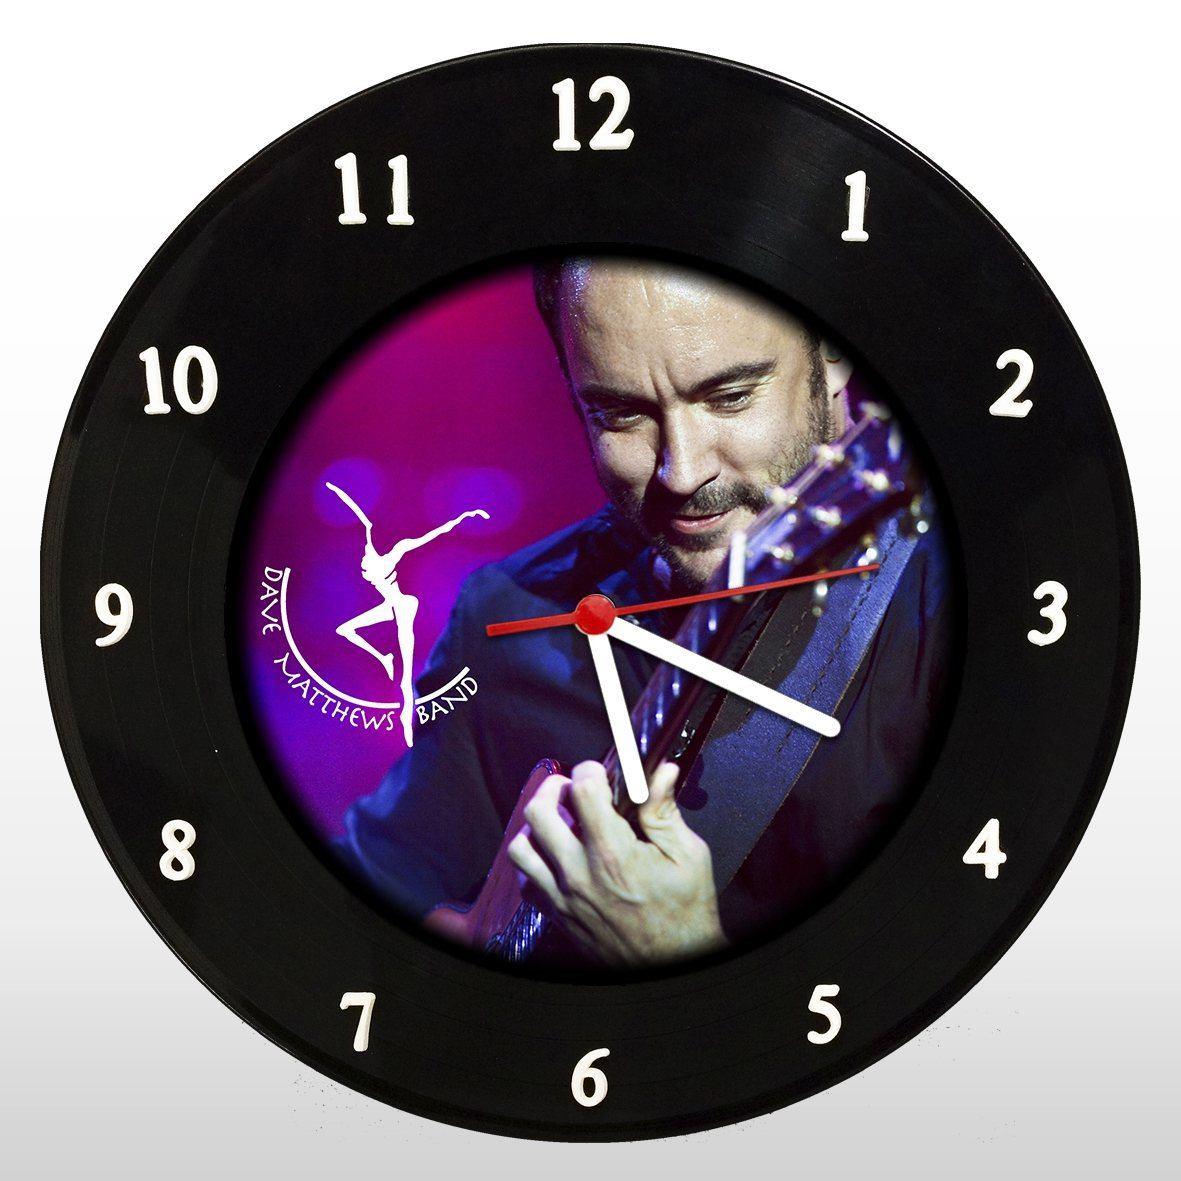 Dave Matthews Band - Relógio de Parede em Disco de Vinil - Mr. Rock